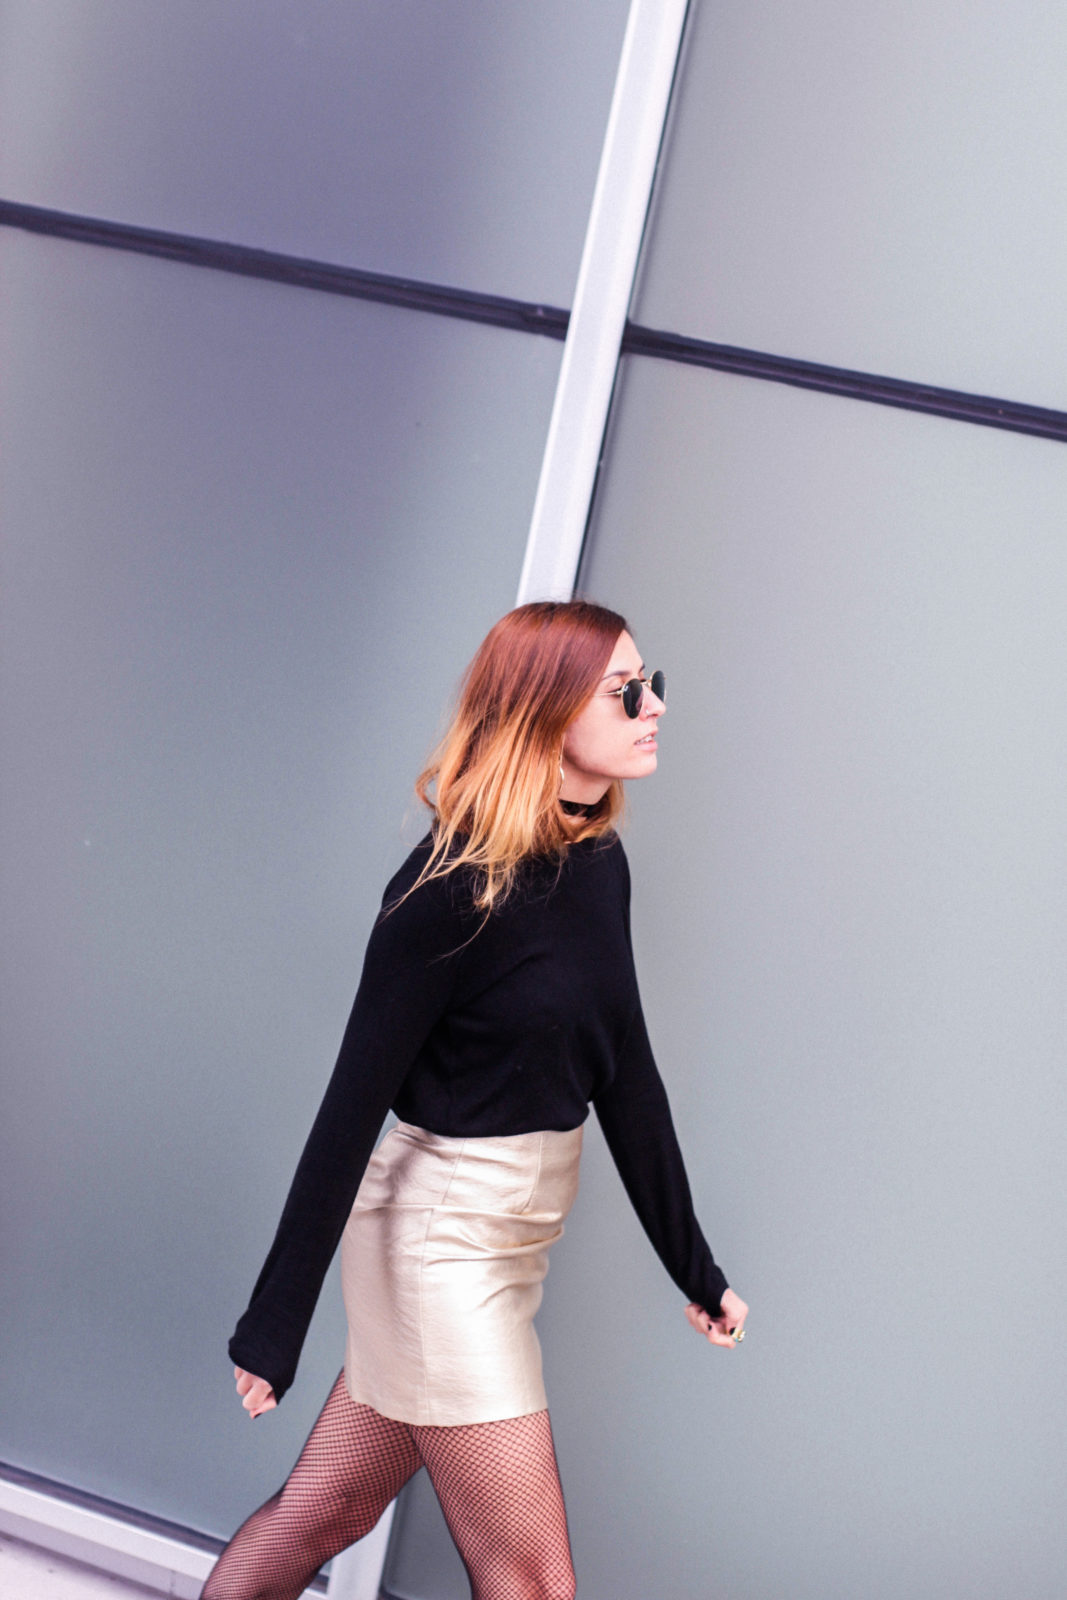 falda_dorada_shein_metalizado_medias_de_rejilla_choker_donkeycool_street_style_trends_2016-32